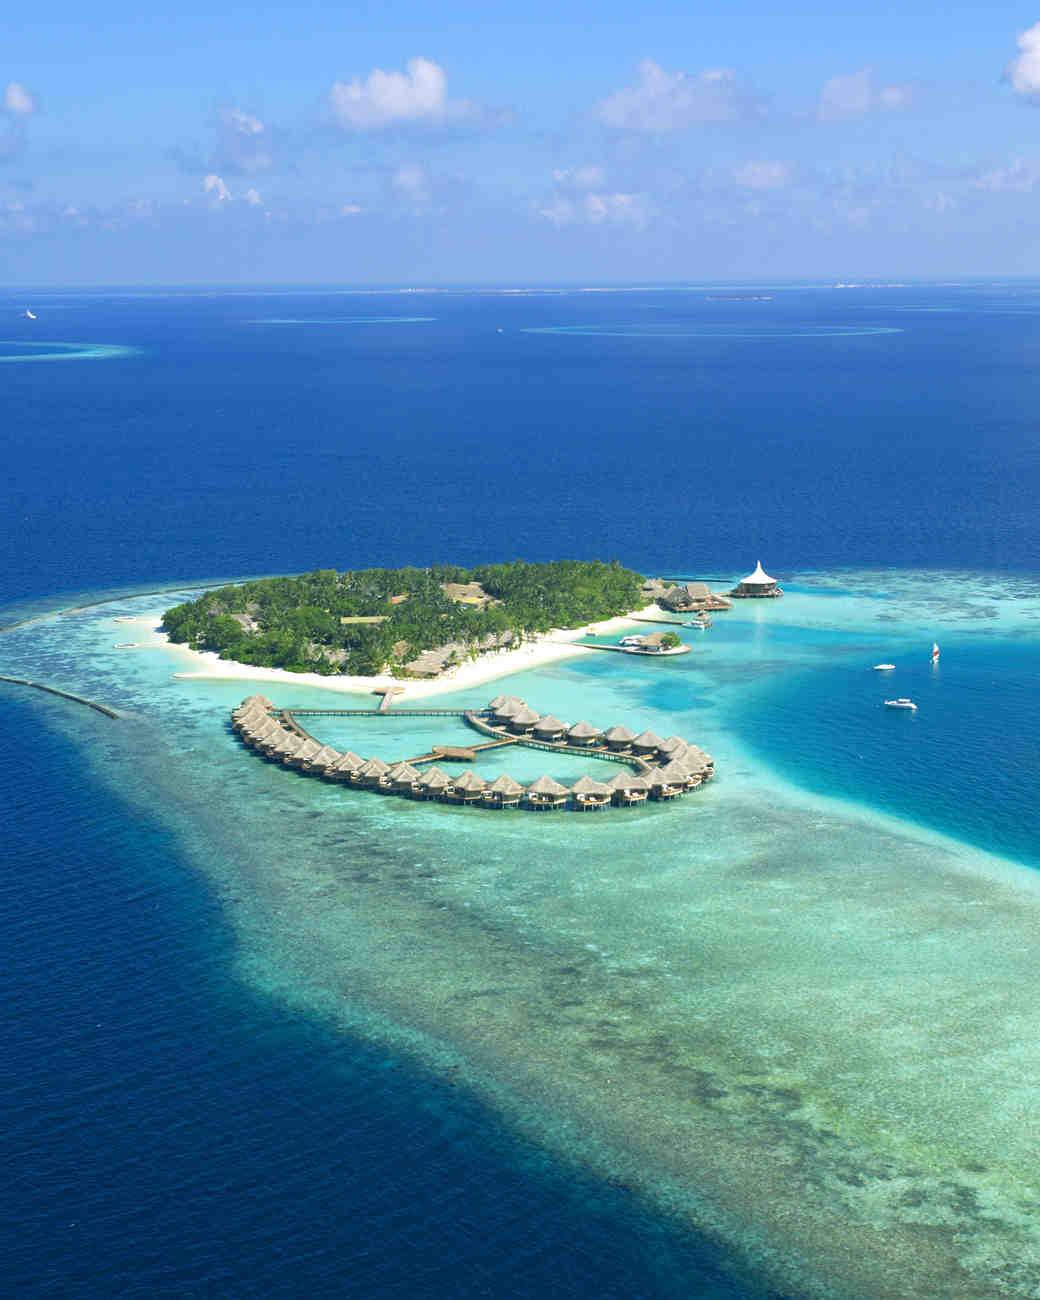 baros-maldives-mwd1011mmsmith.jpg